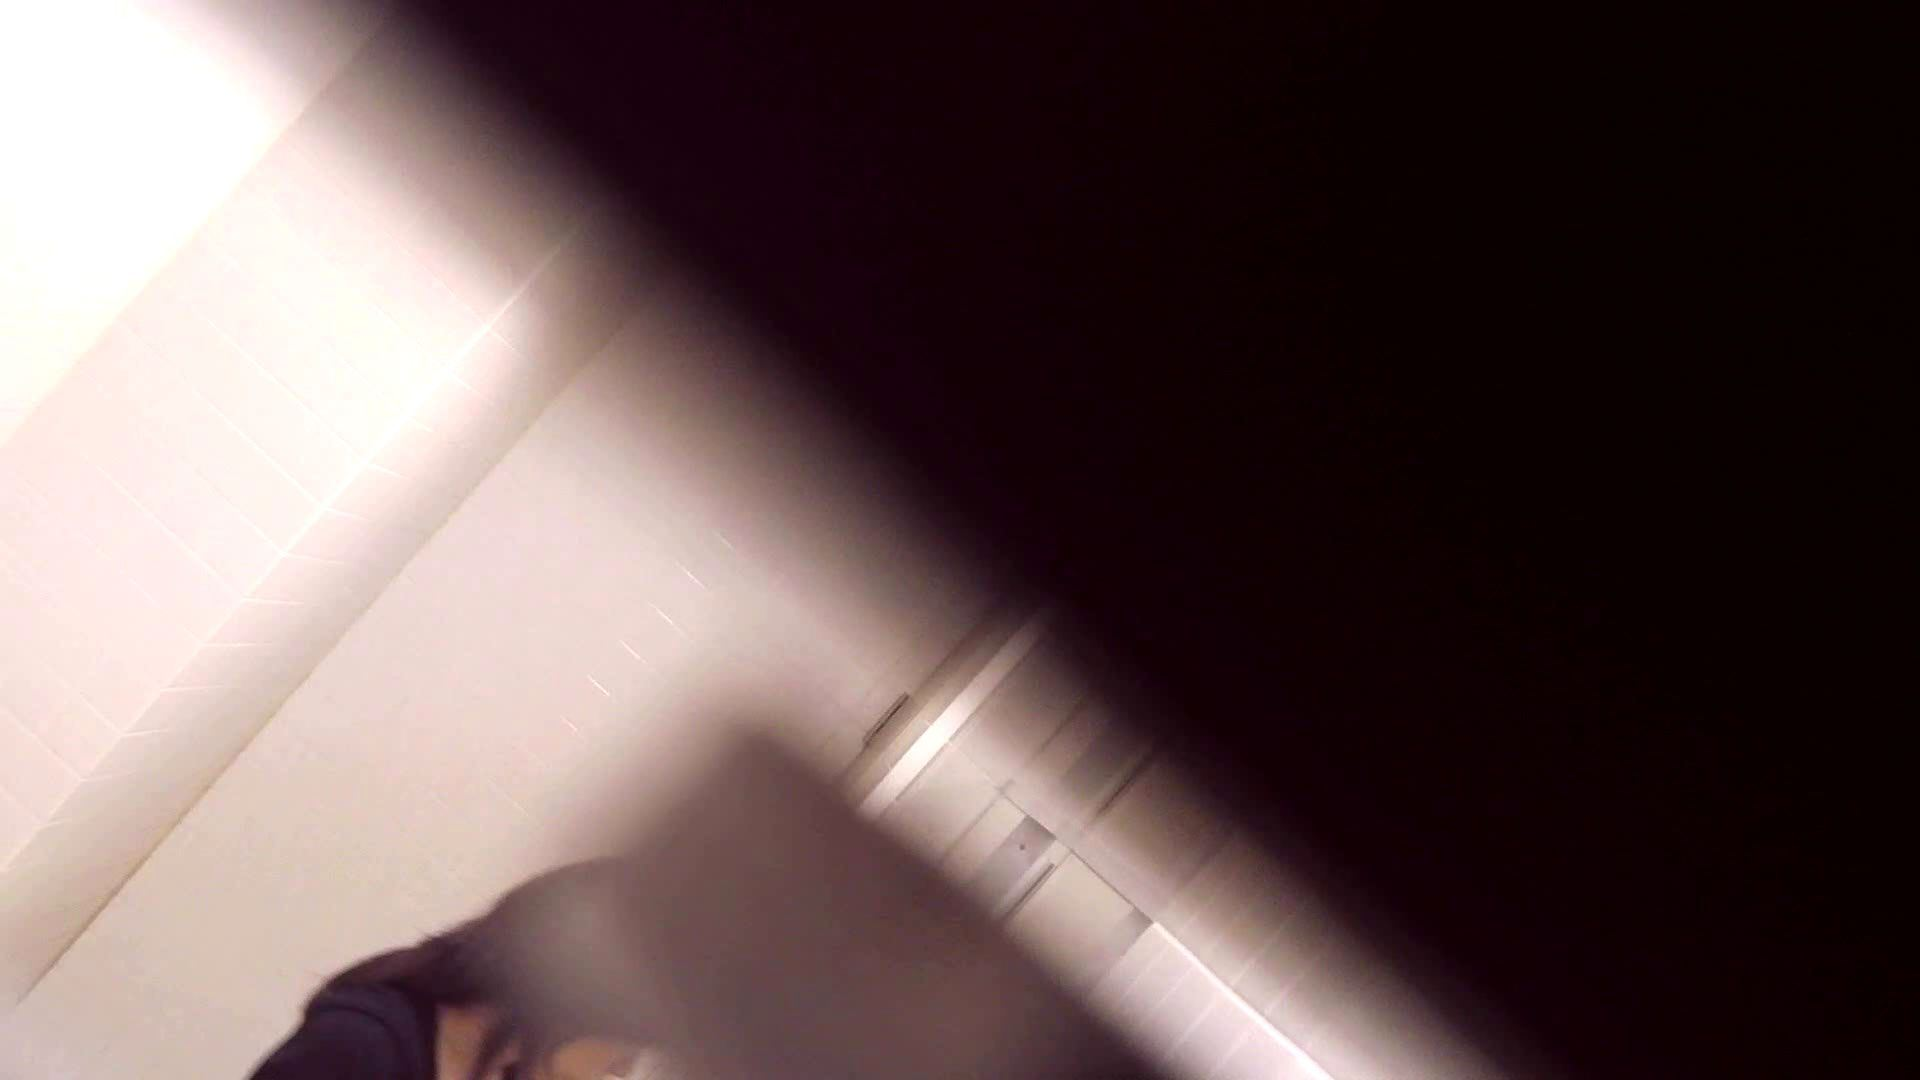 vol.17 命がけ潜伏洗面所! 張り裂けんばかりの大物 潜入突撃 セックス画像 88pic 2